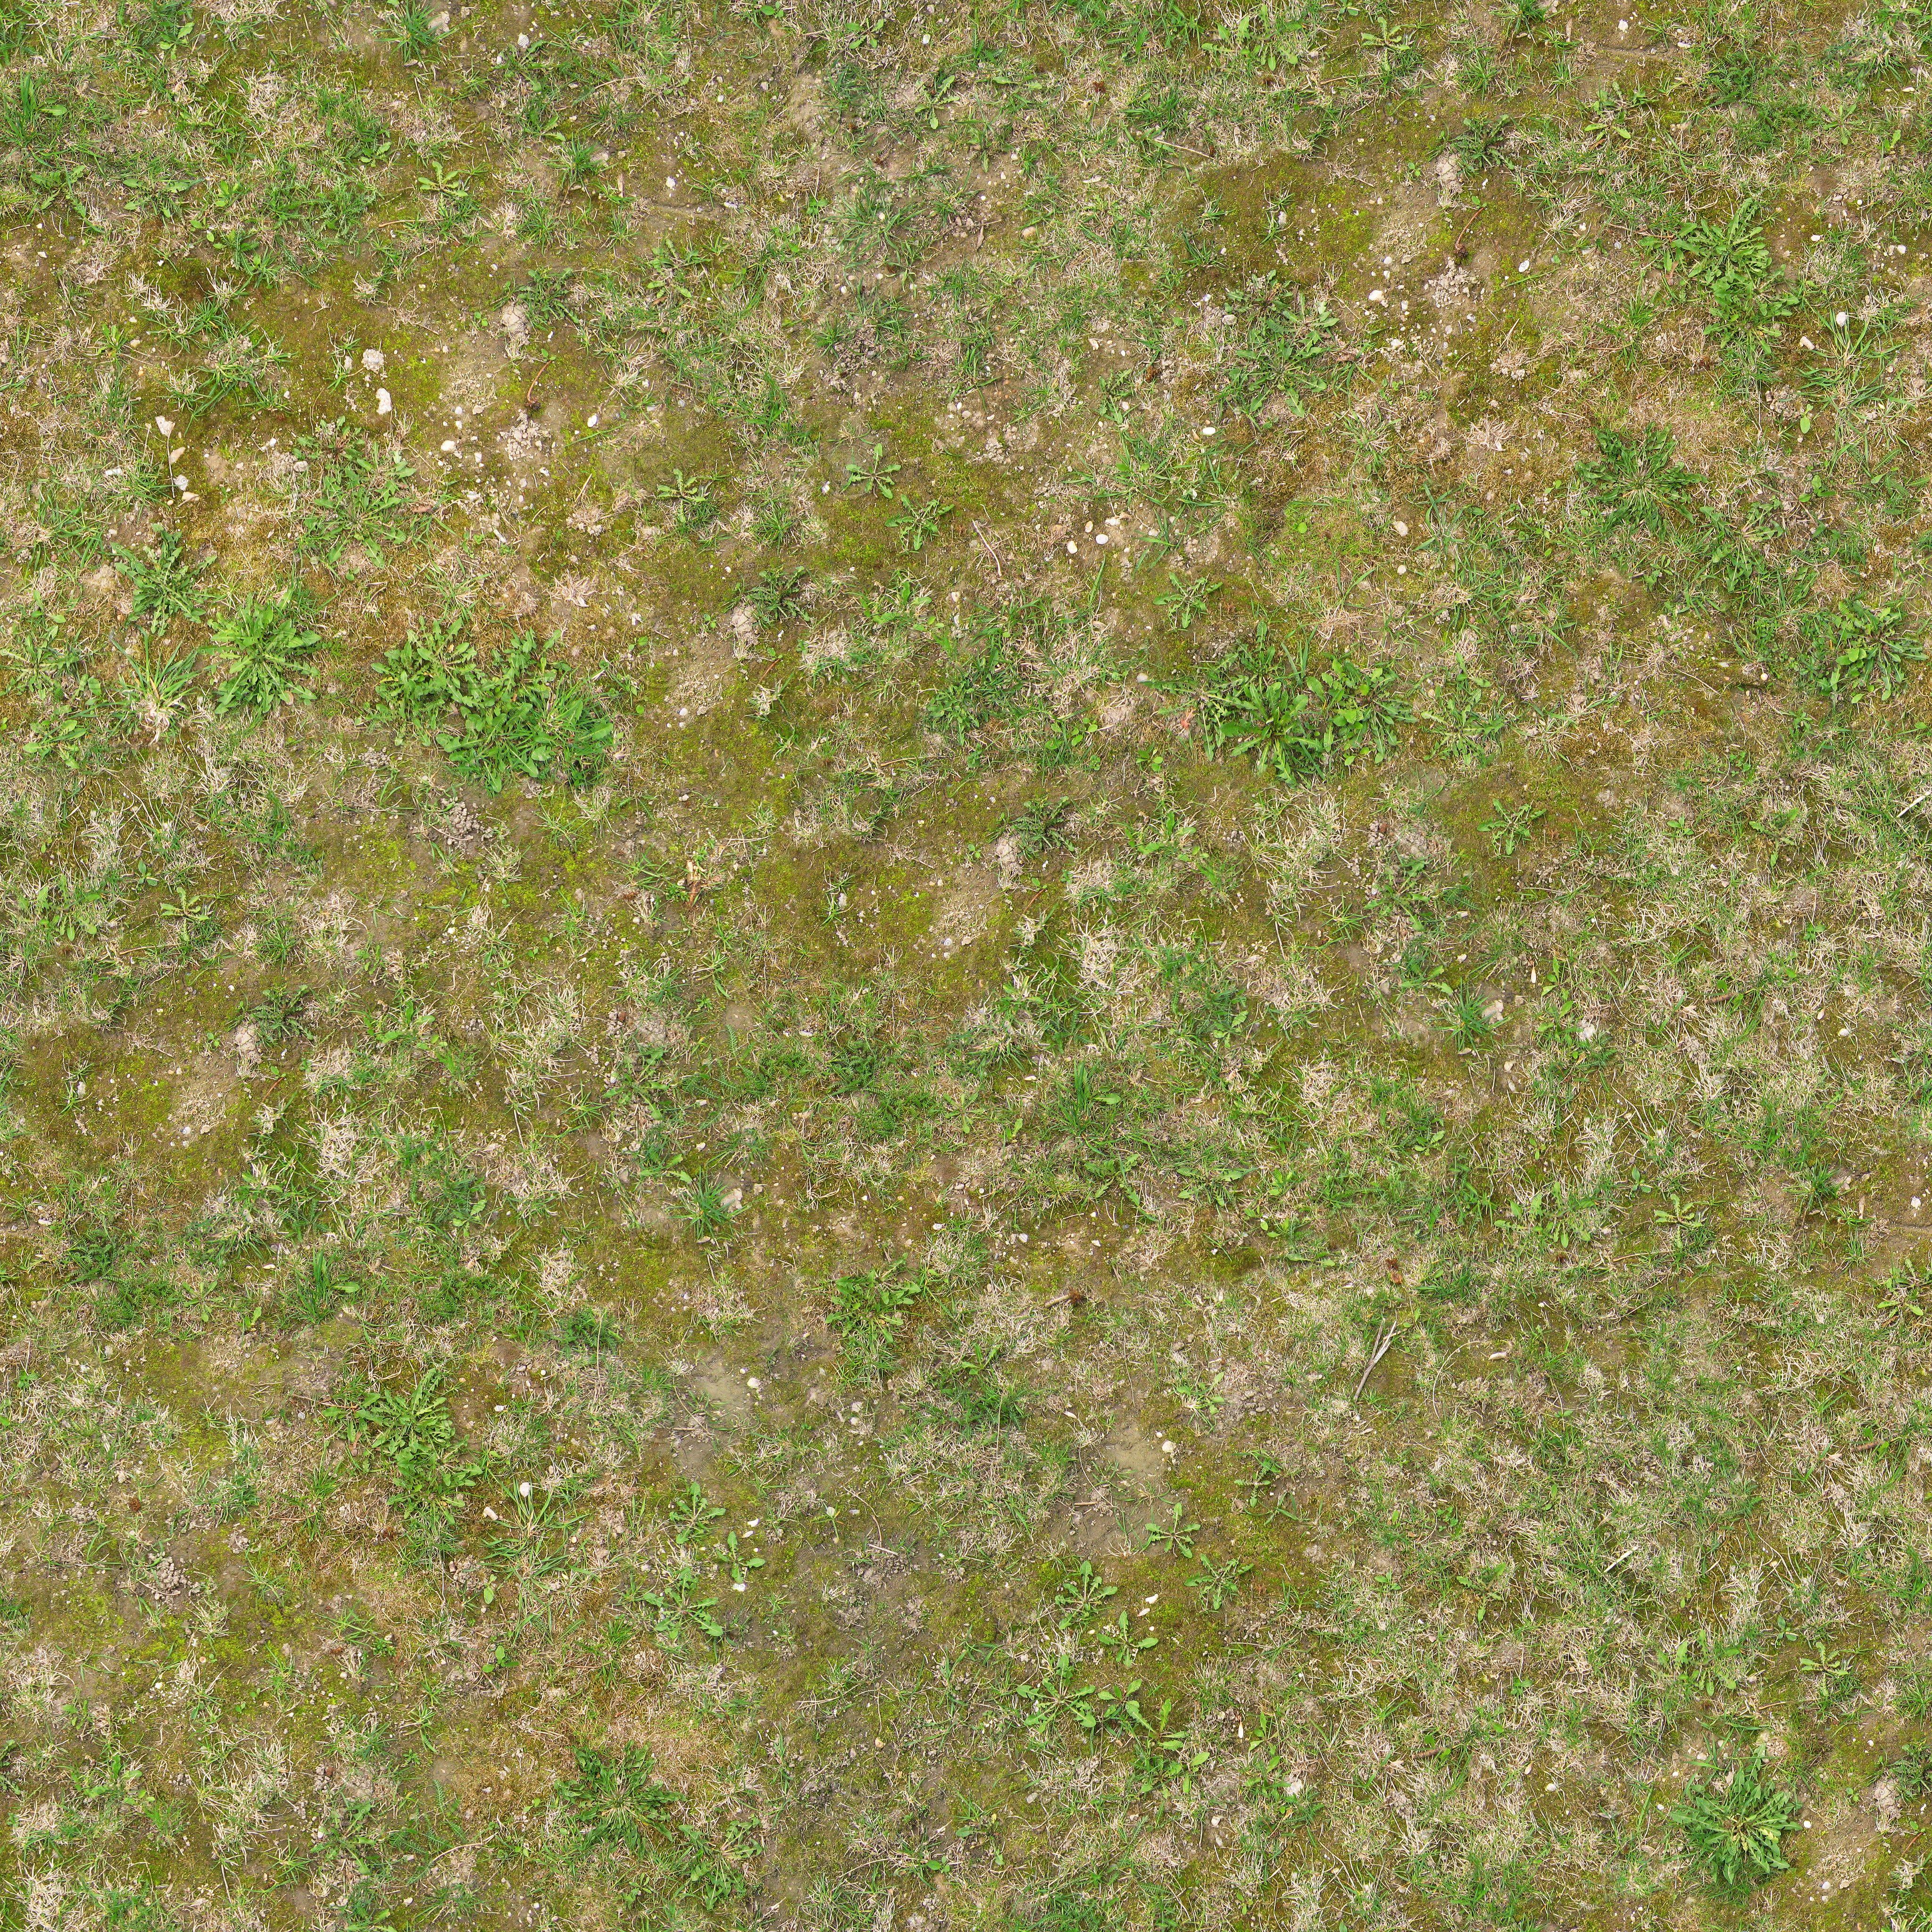 Textures architecture roads roads dirt road texture seamless - Texture Jpg Ground Grass Seamless